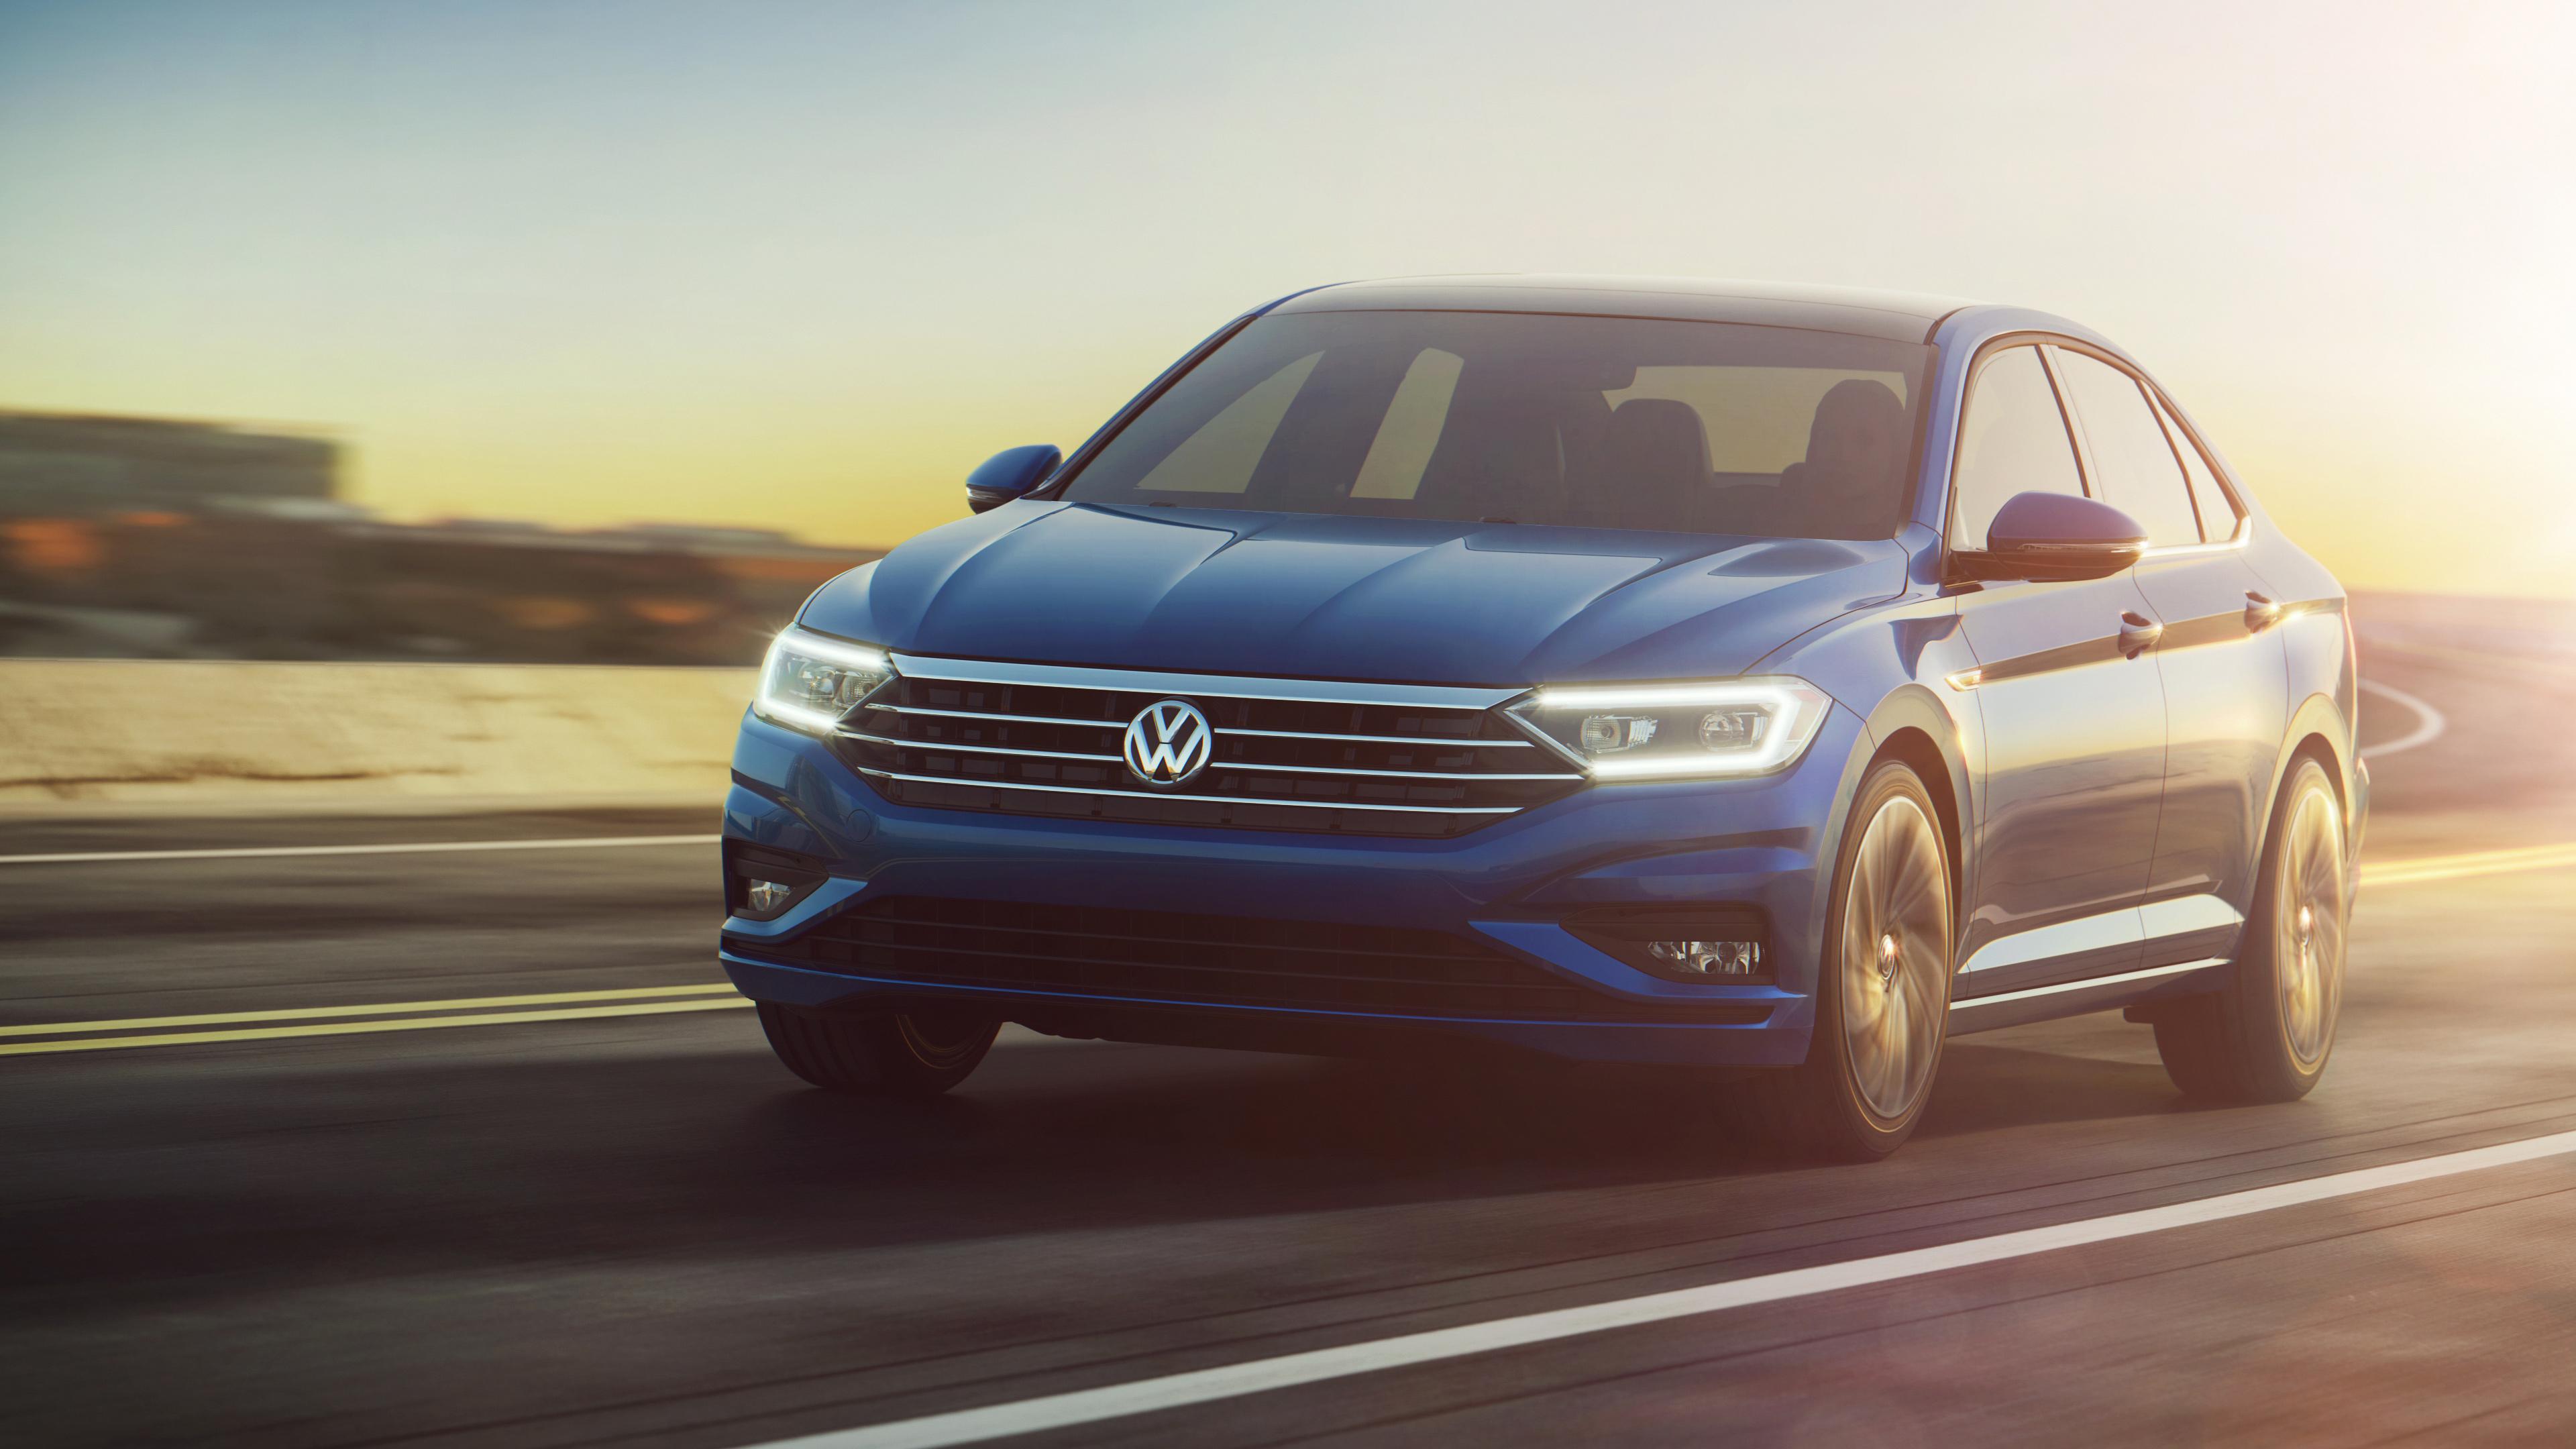 2019 Volkswagen Jetta 4K Wallpaper HD Car Wallpapers ID 9450 3840x2160